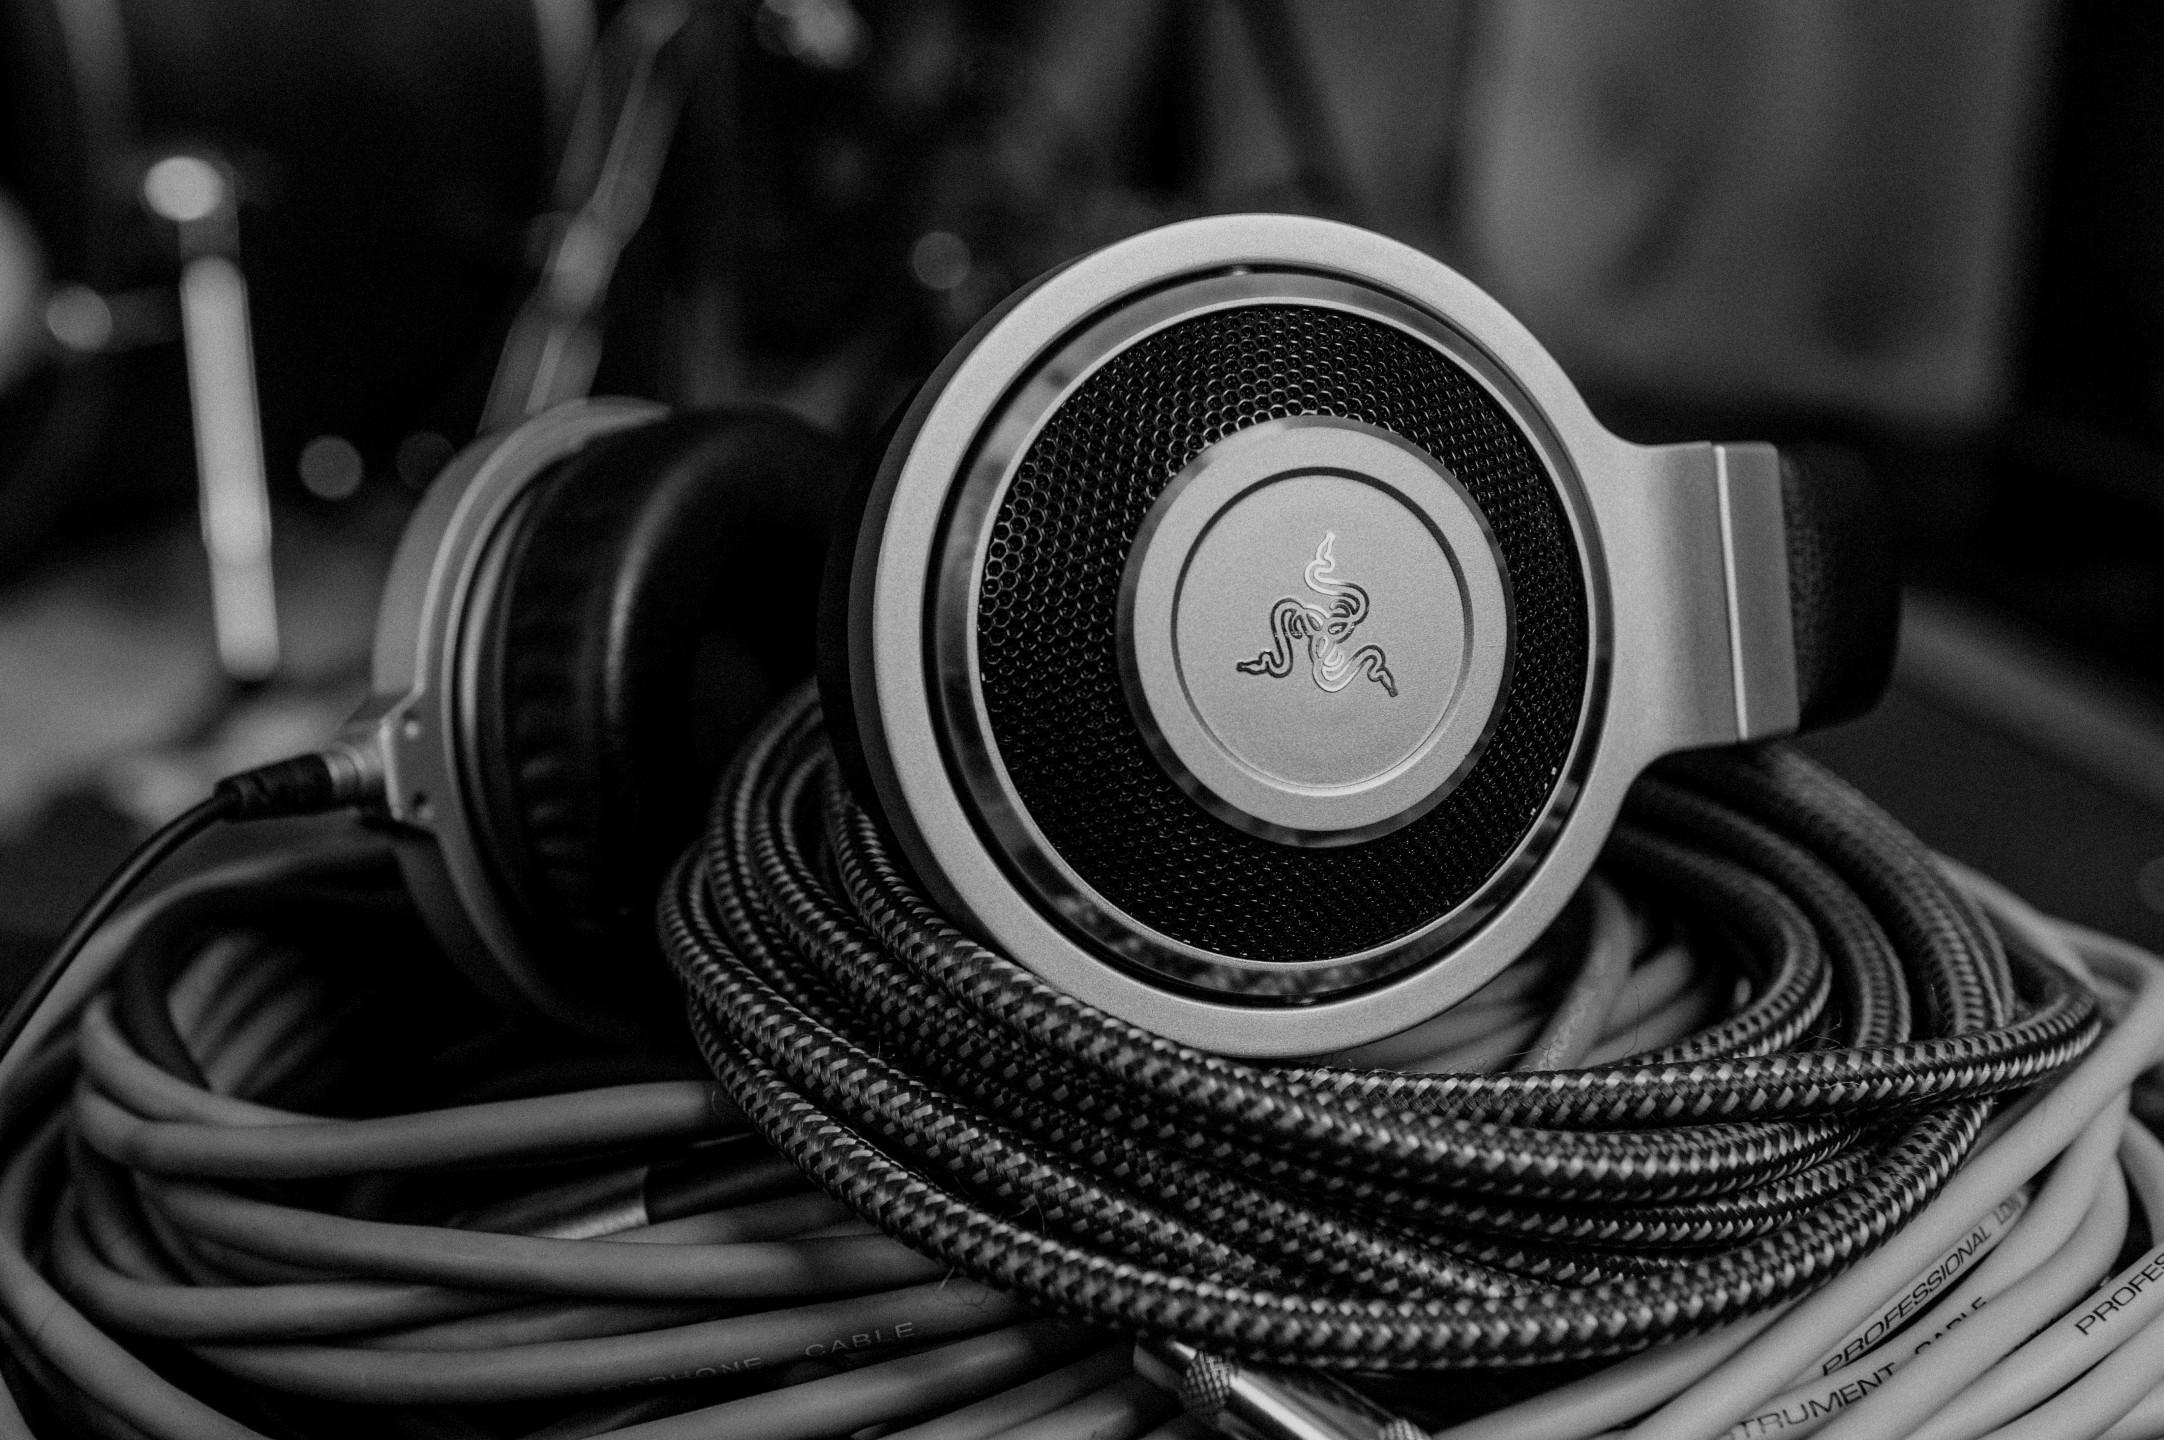 Razer Kraken Forged Edition kõrvaklapid tõsistele seppadele